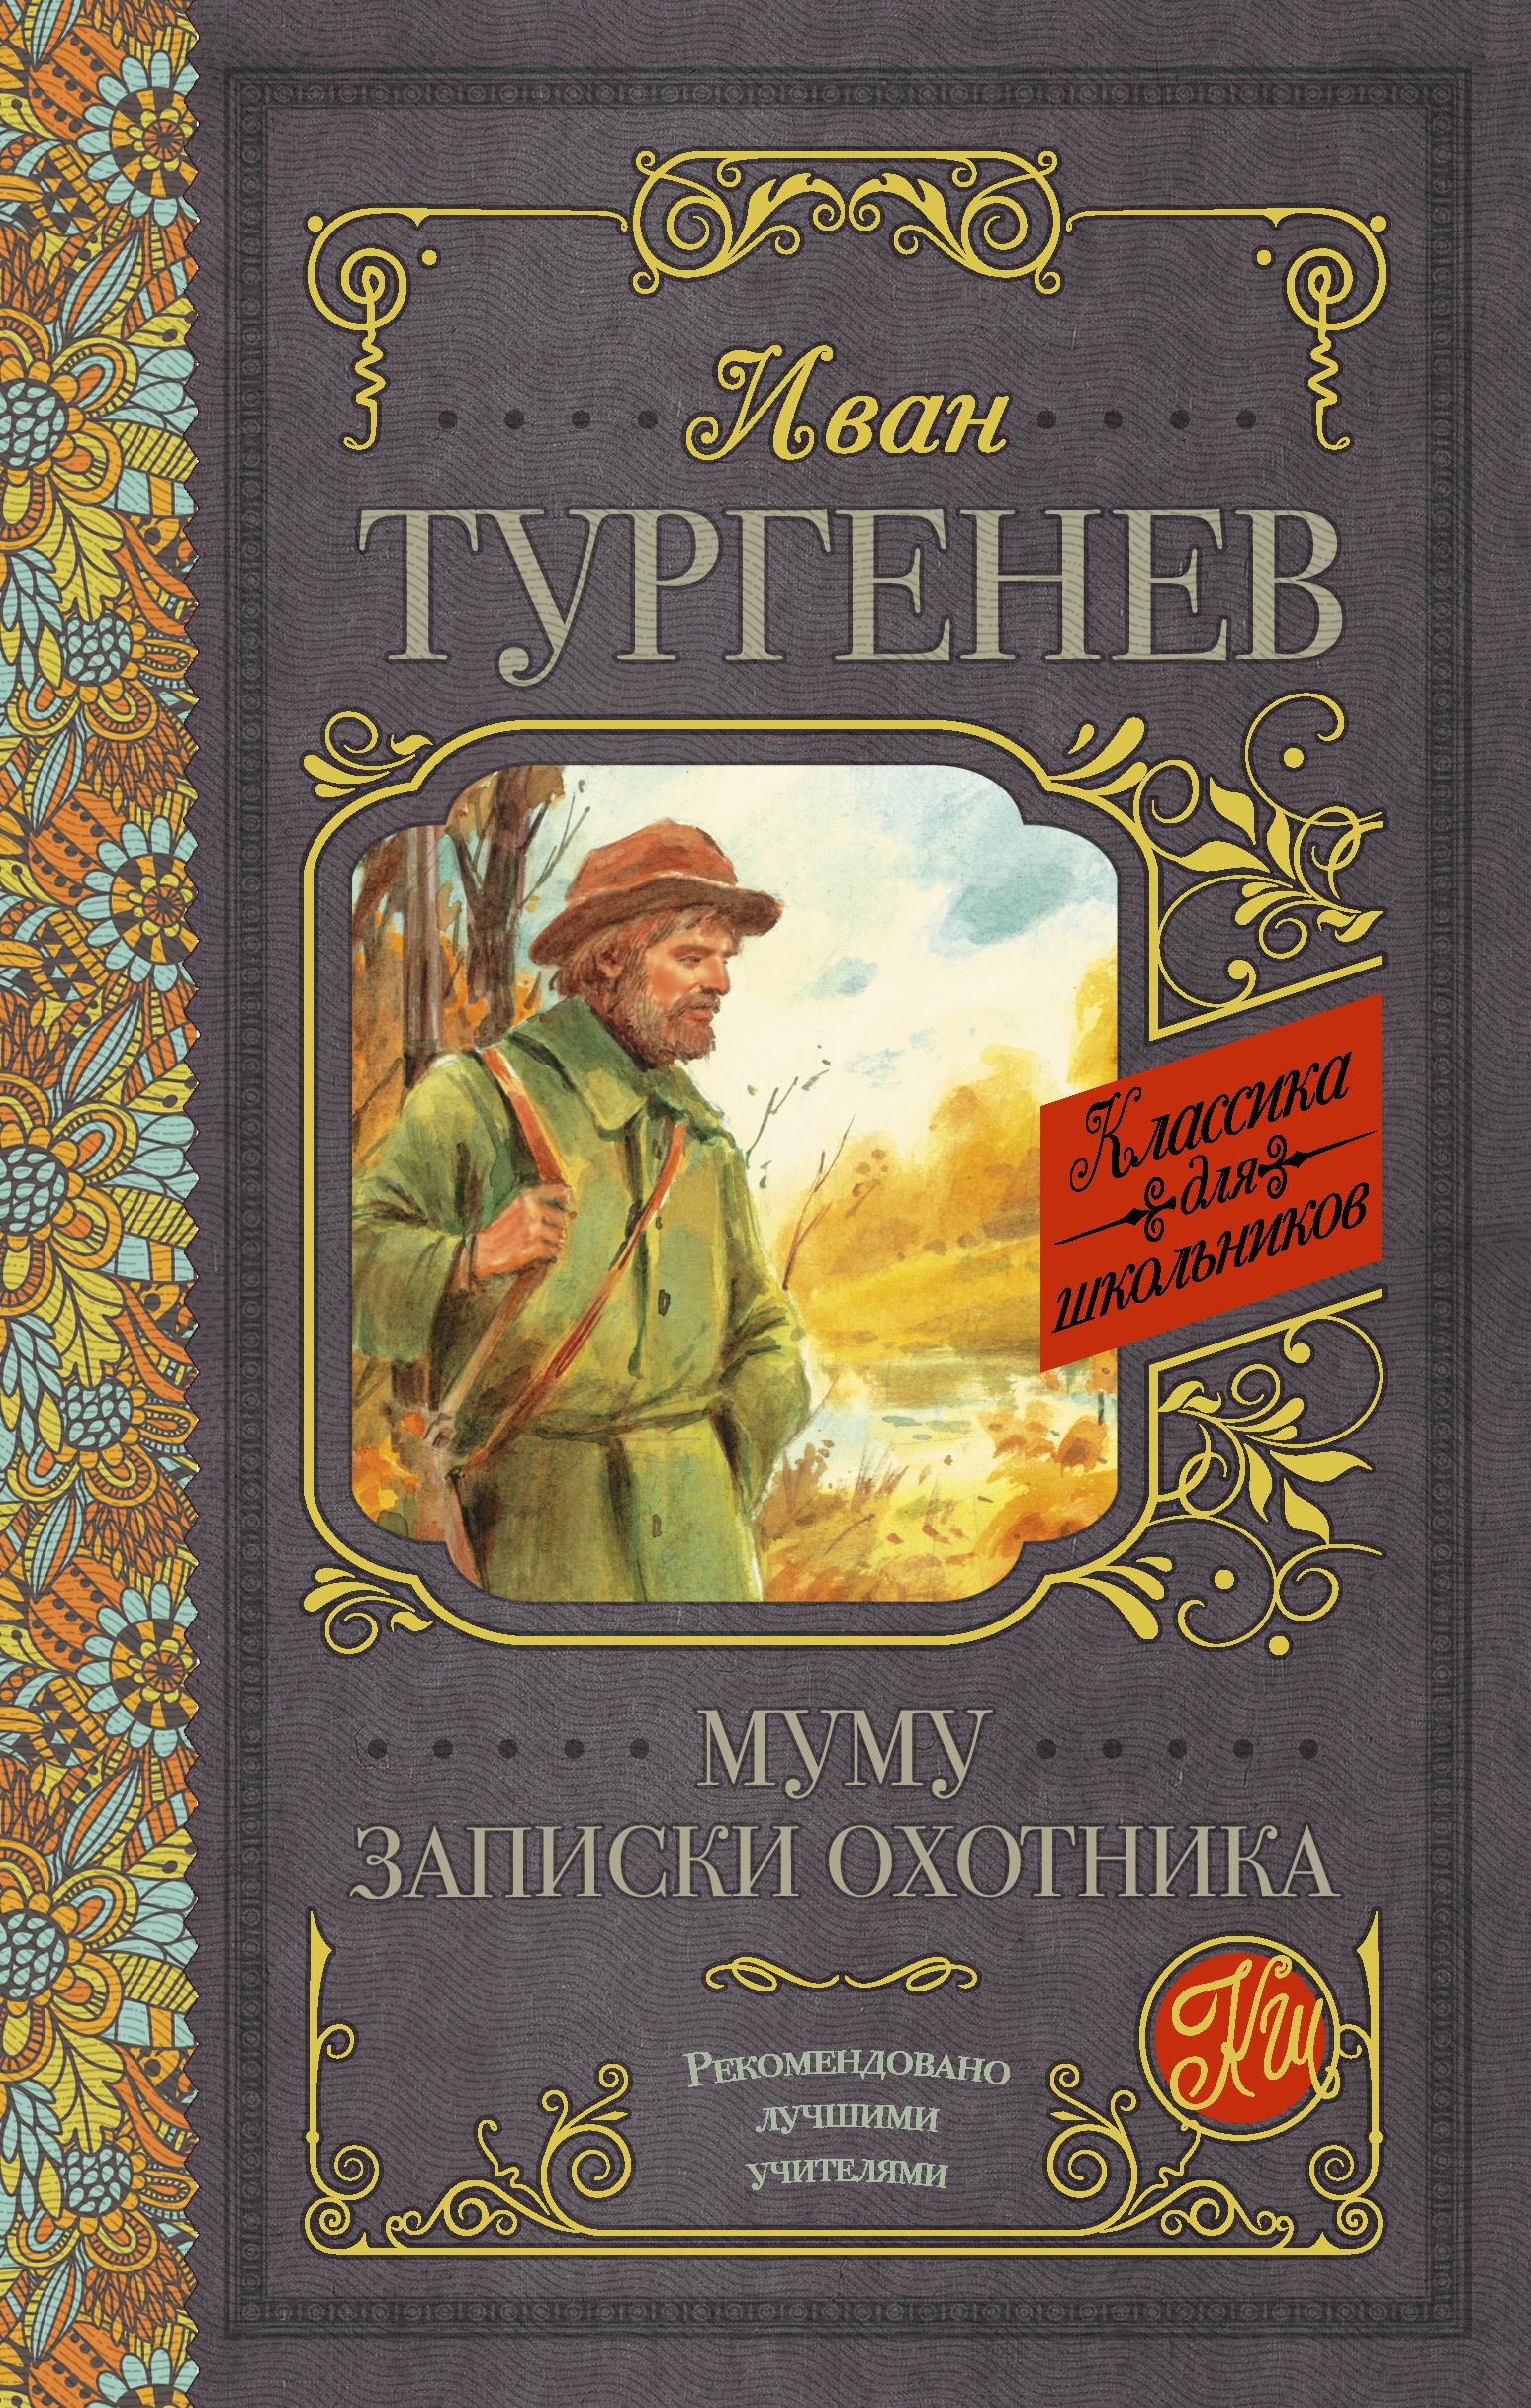 Муму. Записки охотника   Тургенев Иван Сергеевич